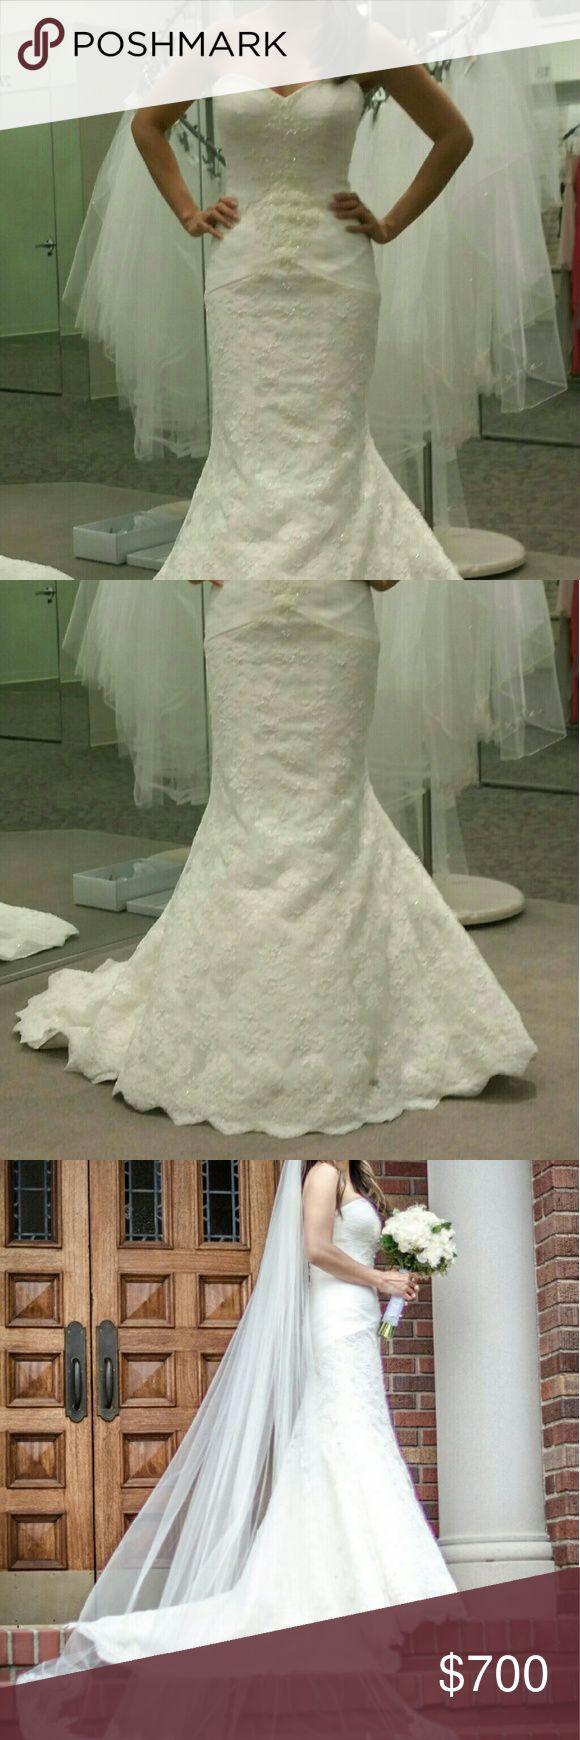 Diy Wedding Dress Preservation Box - Junoir Bridesmaid Dresses